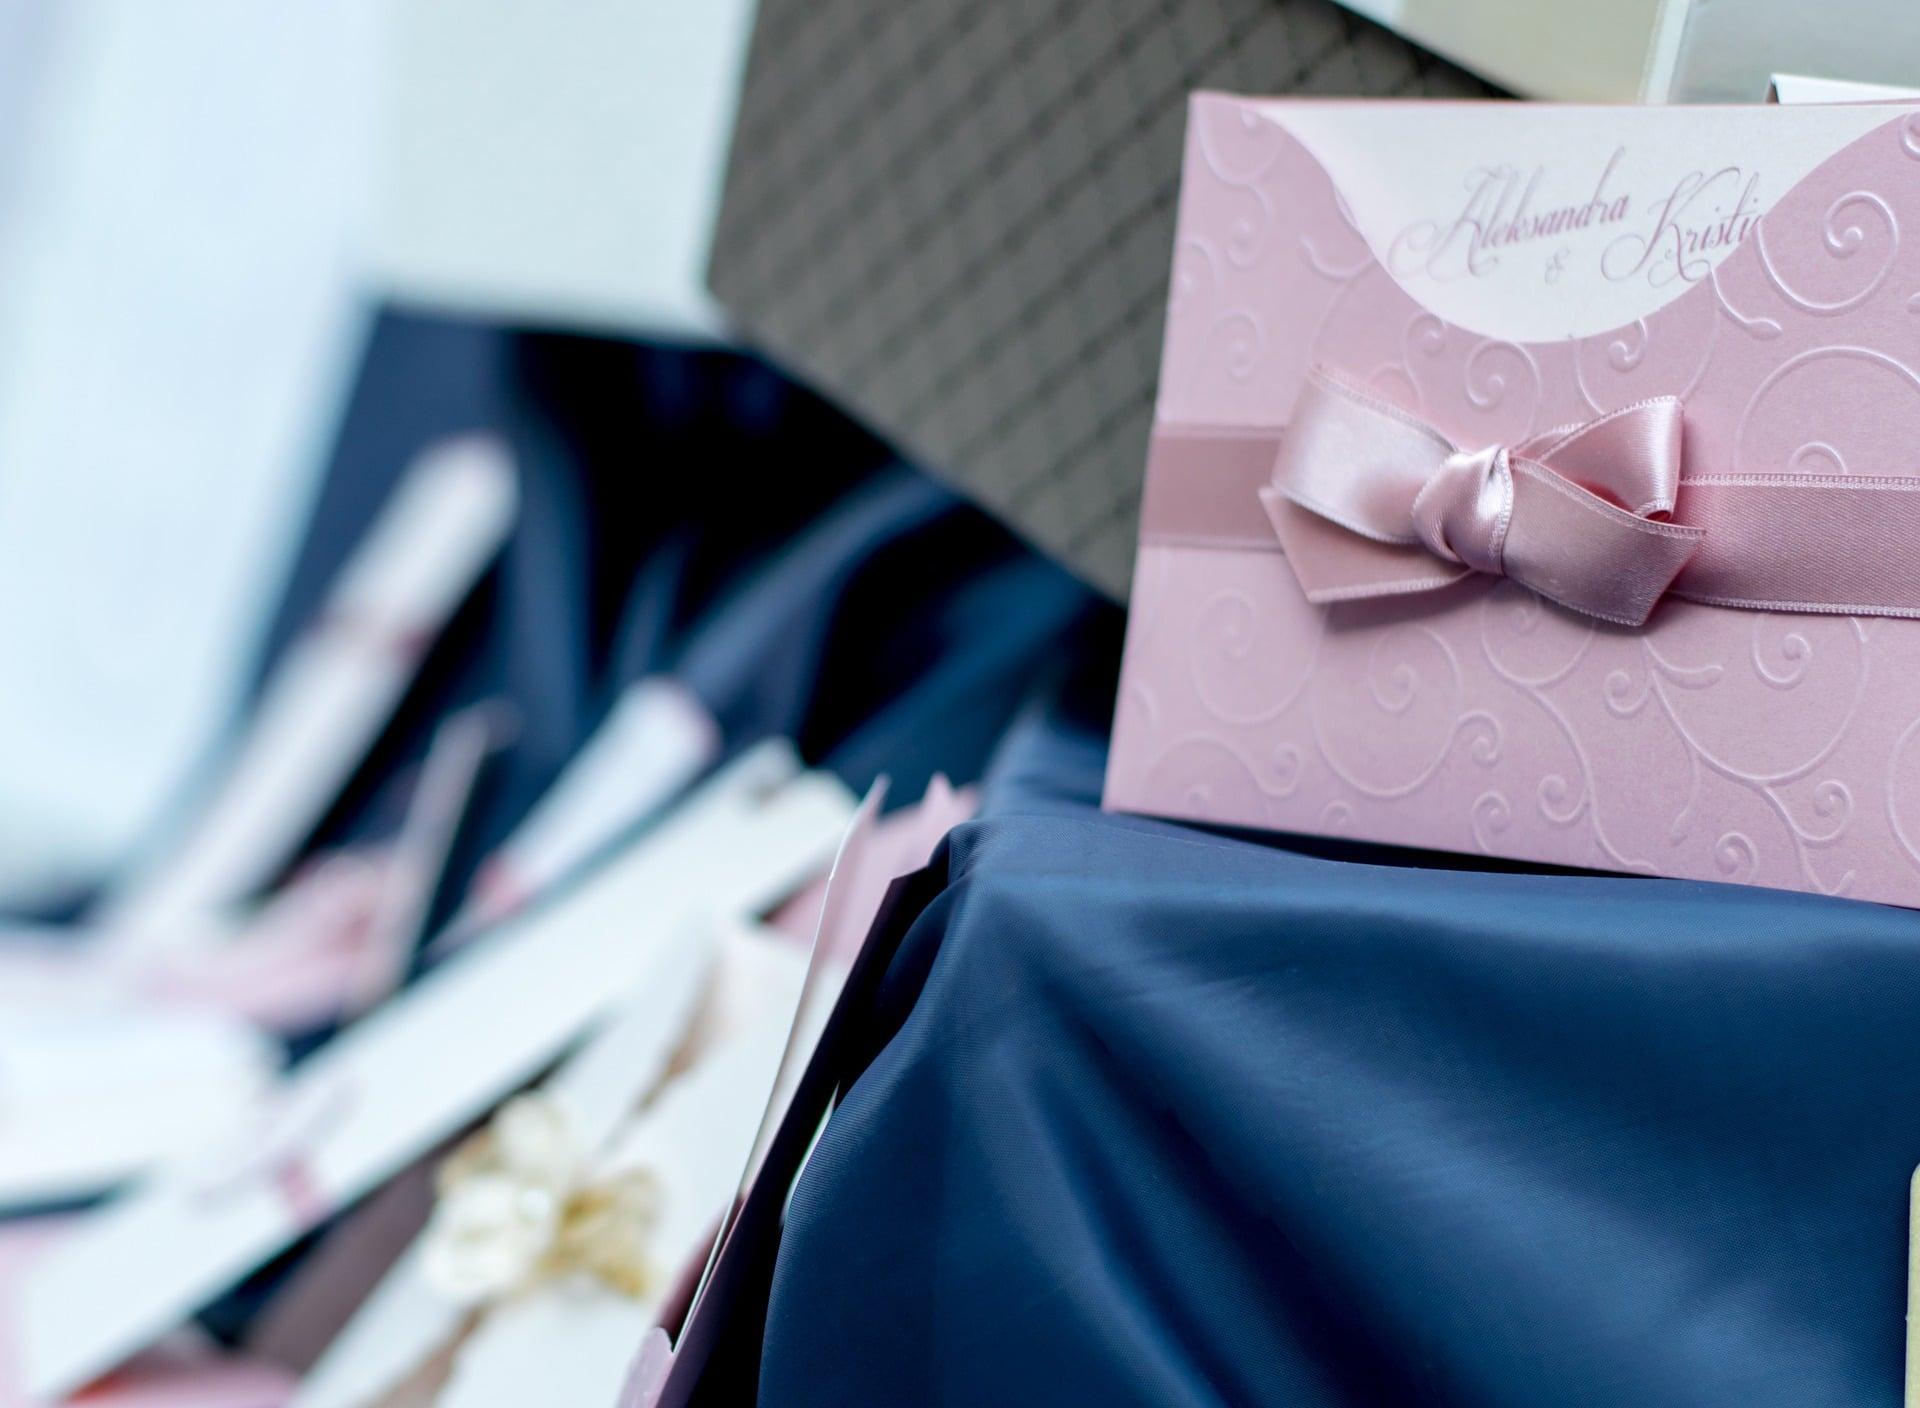 detalle de regalo con lazo rosa